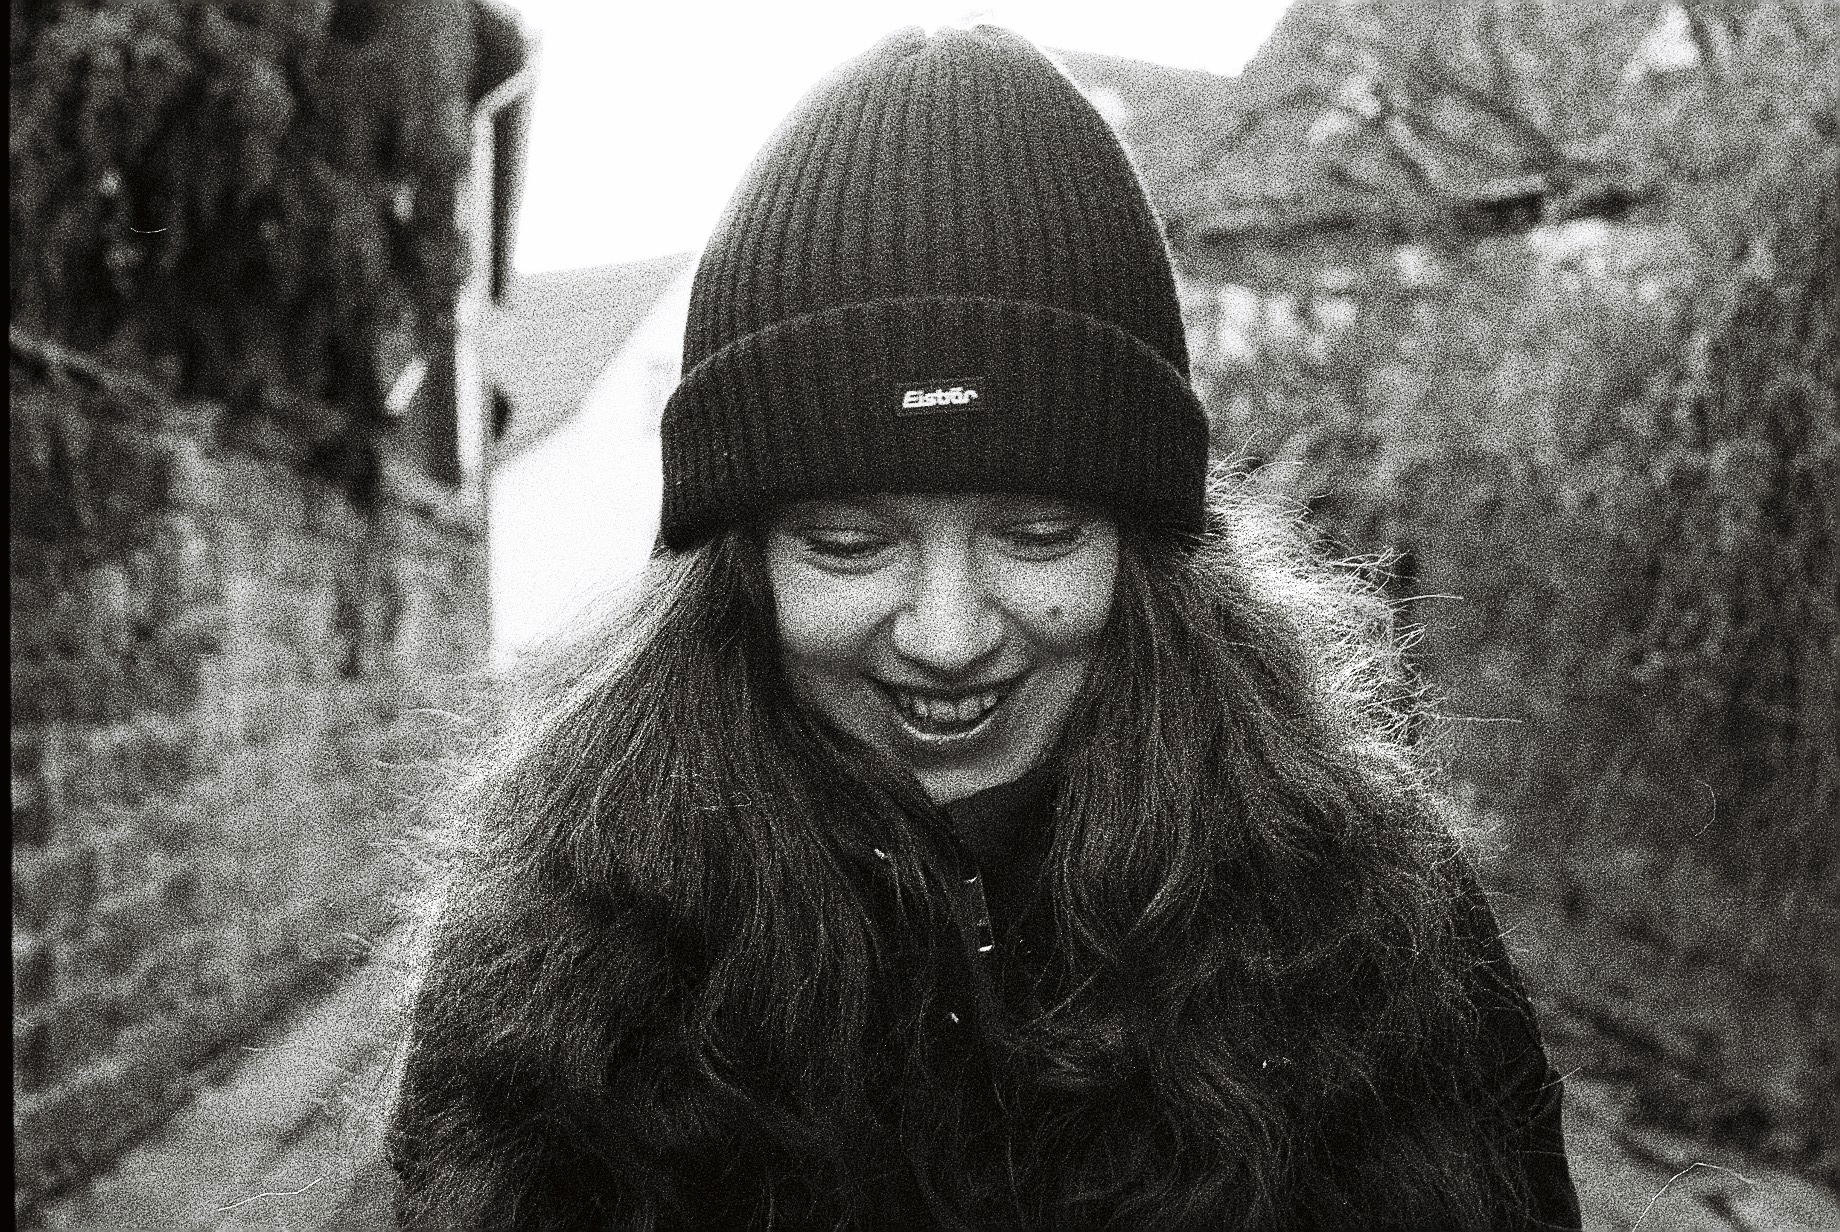 35mm Ilford analog , Garin Alexey